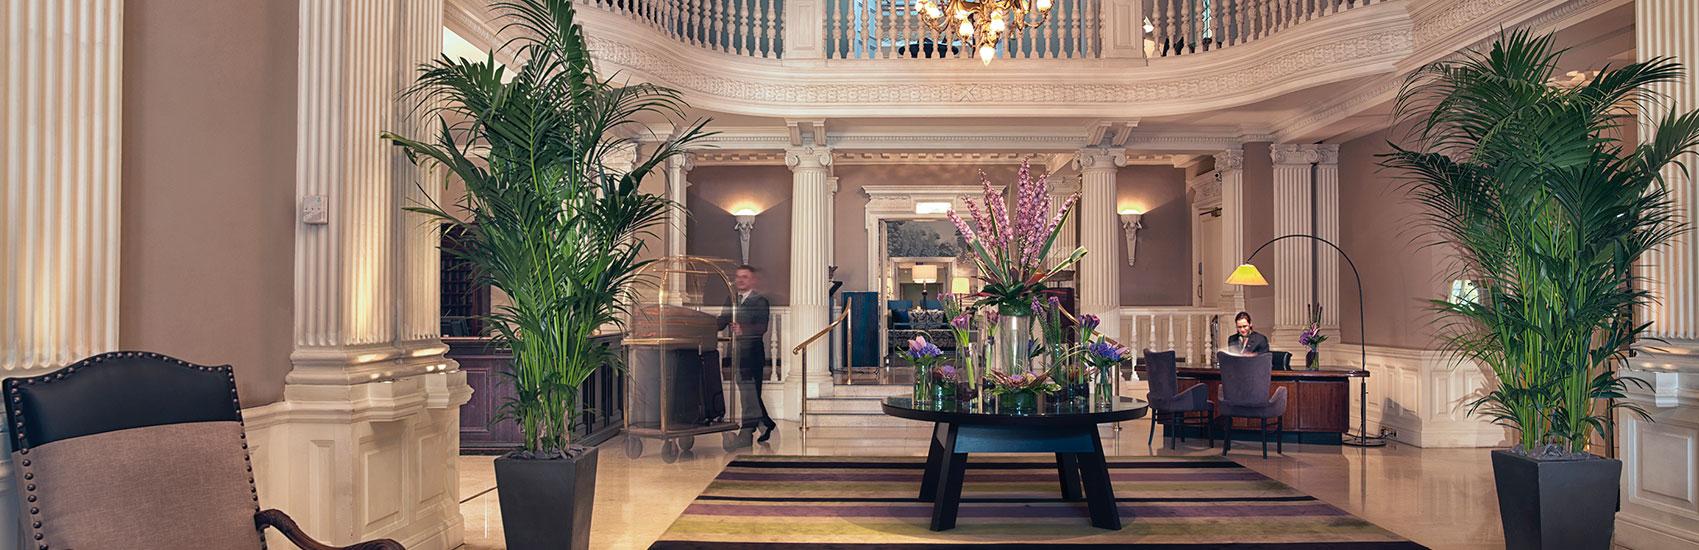 The Balmoral - a Rocco Forte hotel 1